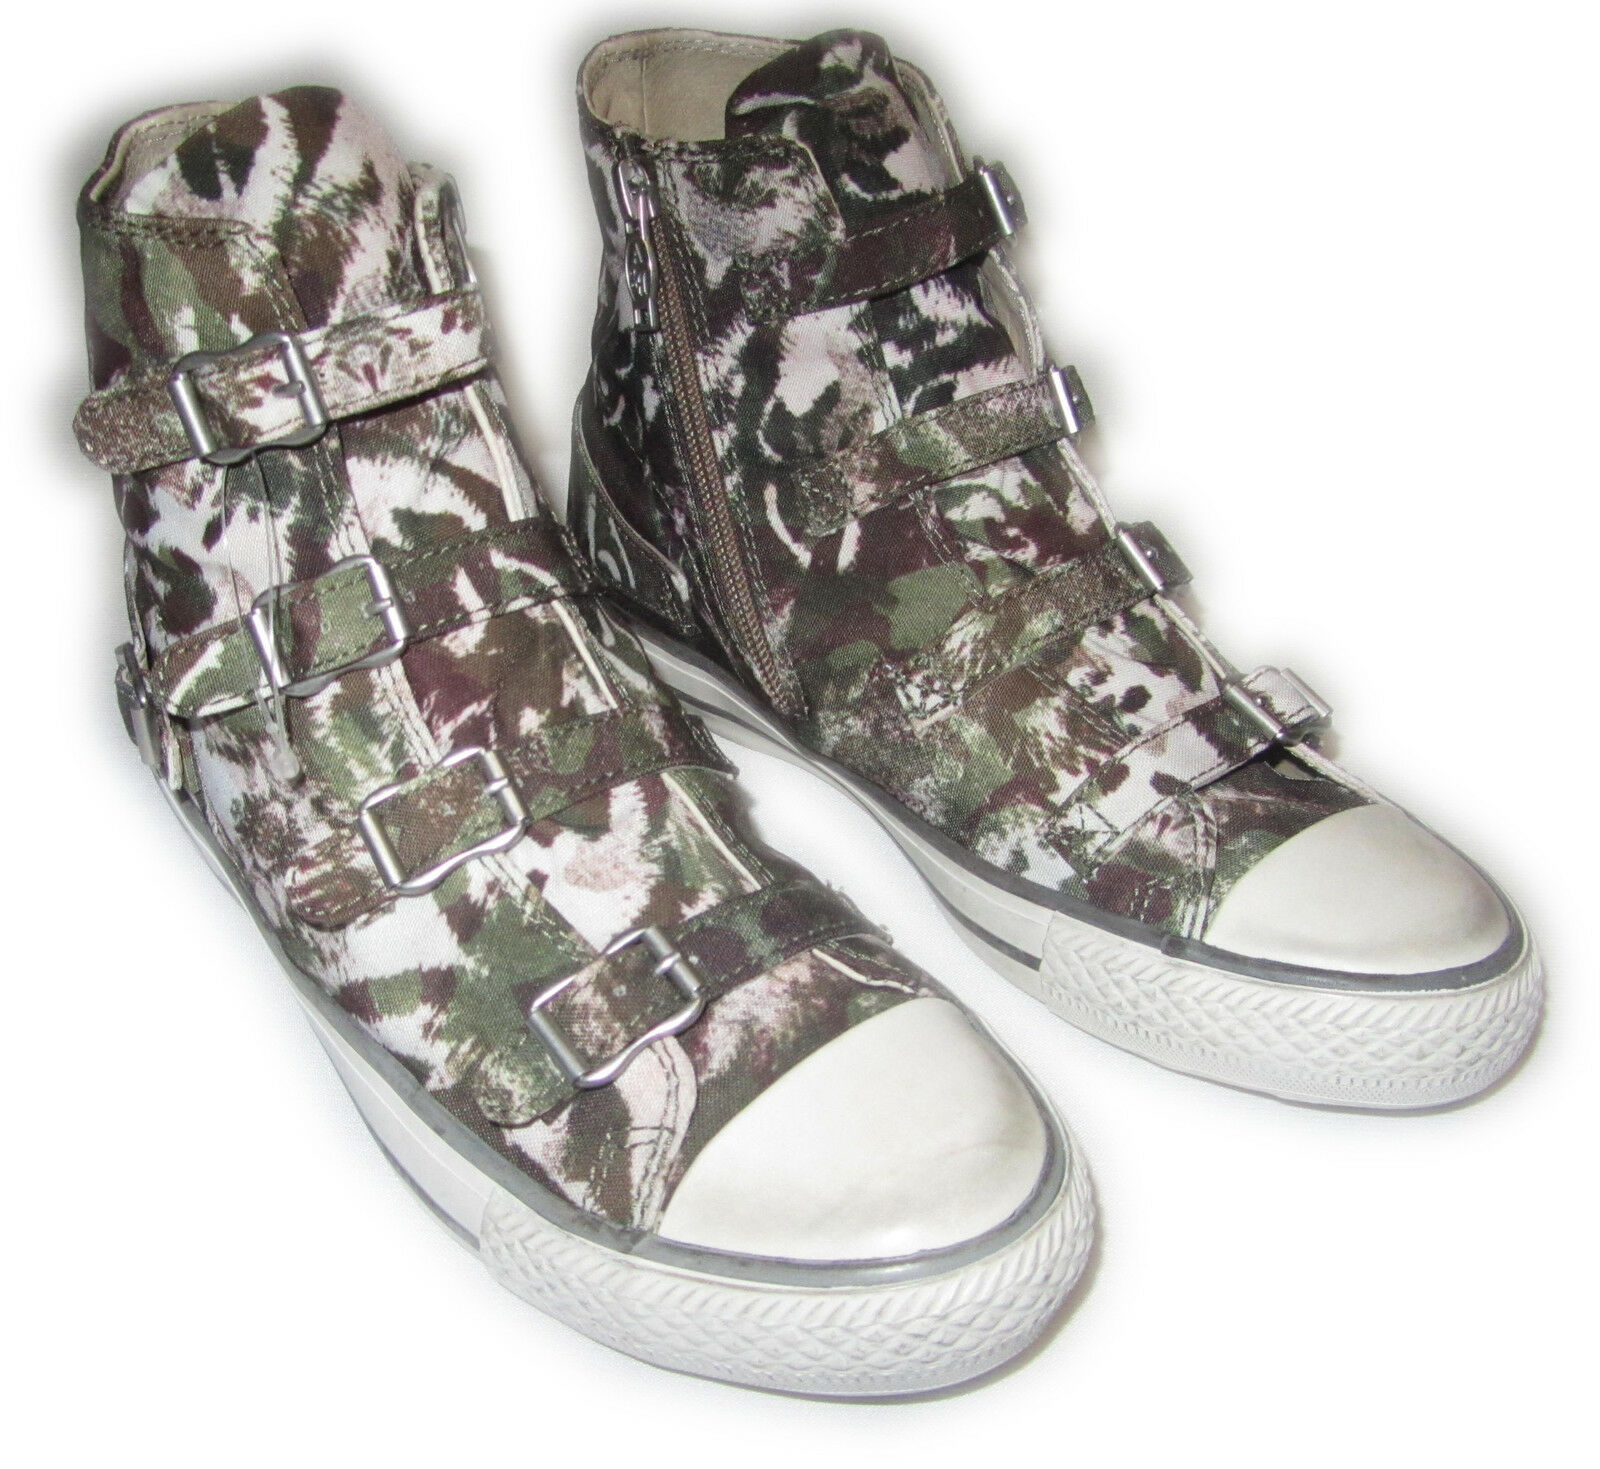 Ash Turnschuhe Schuhe  Virgin - Leder innen - Stoff tarn khaki Gr.  39 40 neu